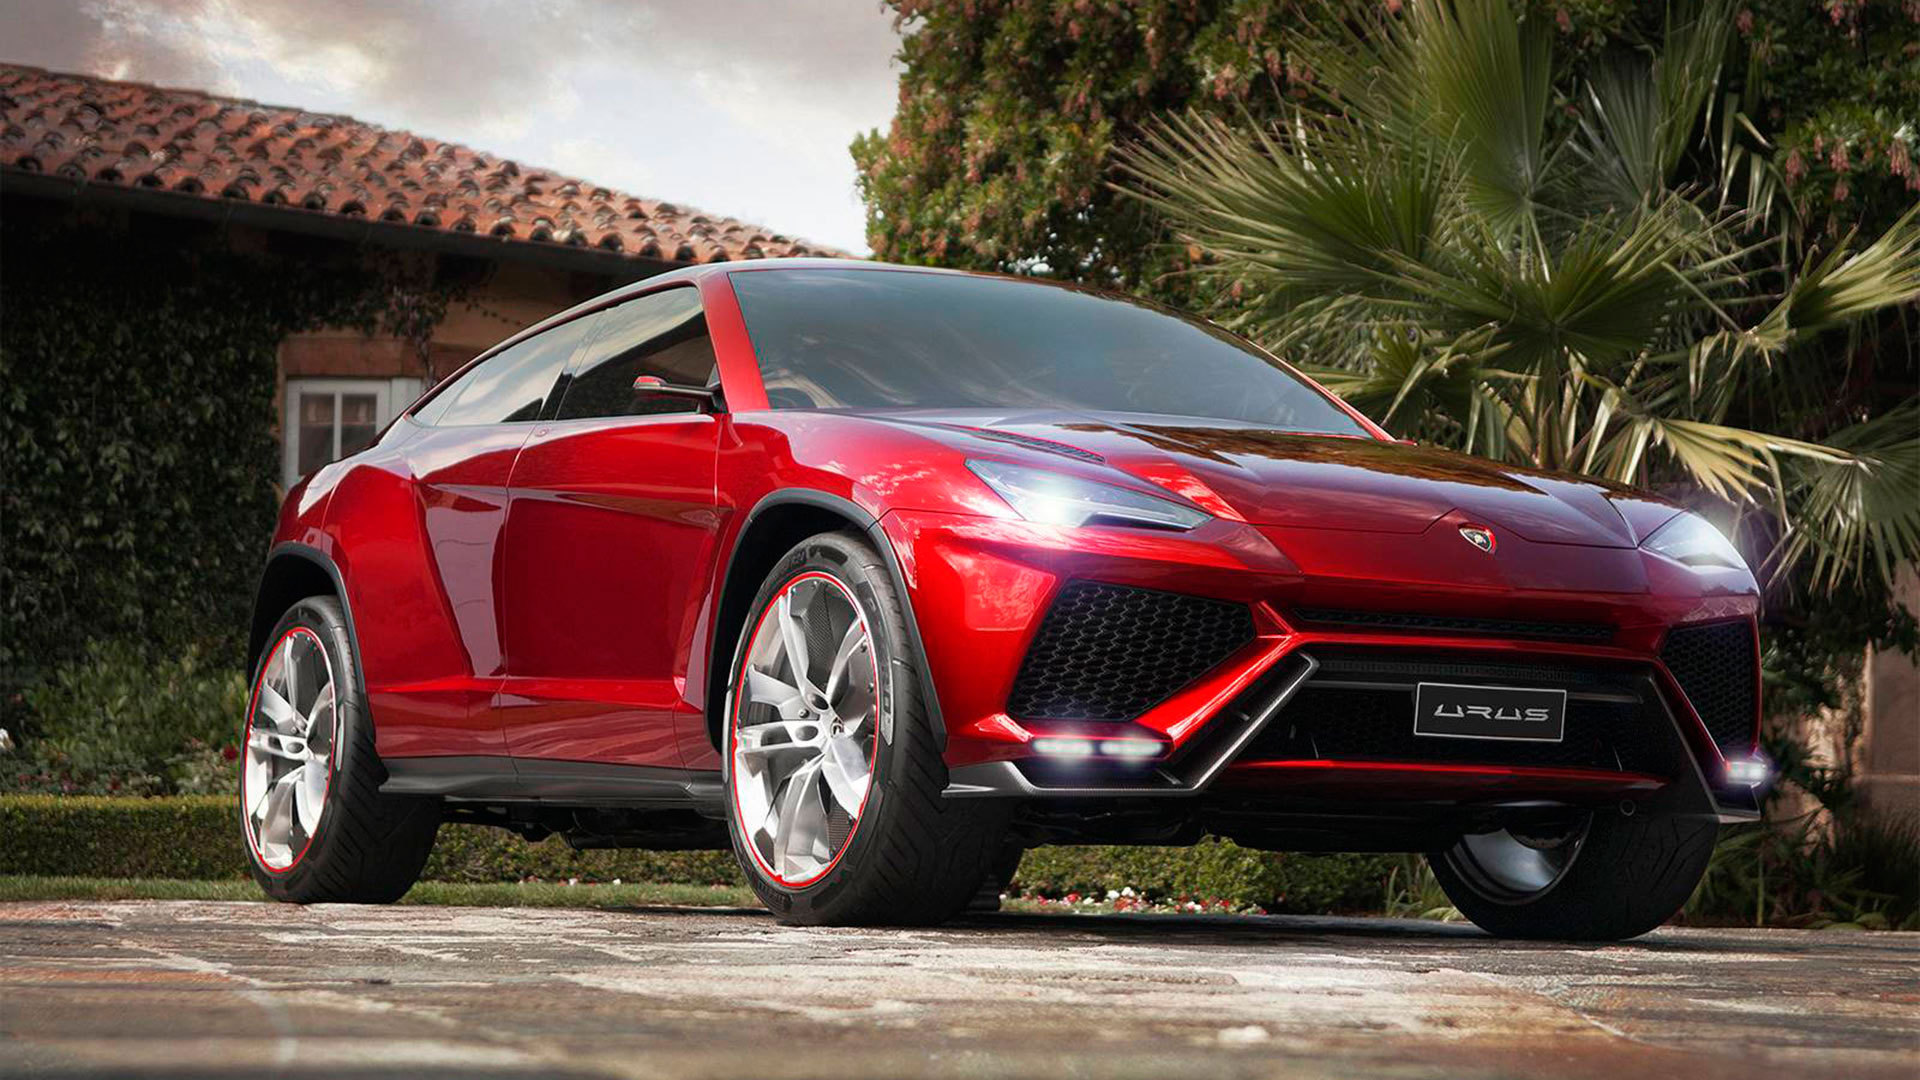 Lamborghini Urus High Definition Wallpapers